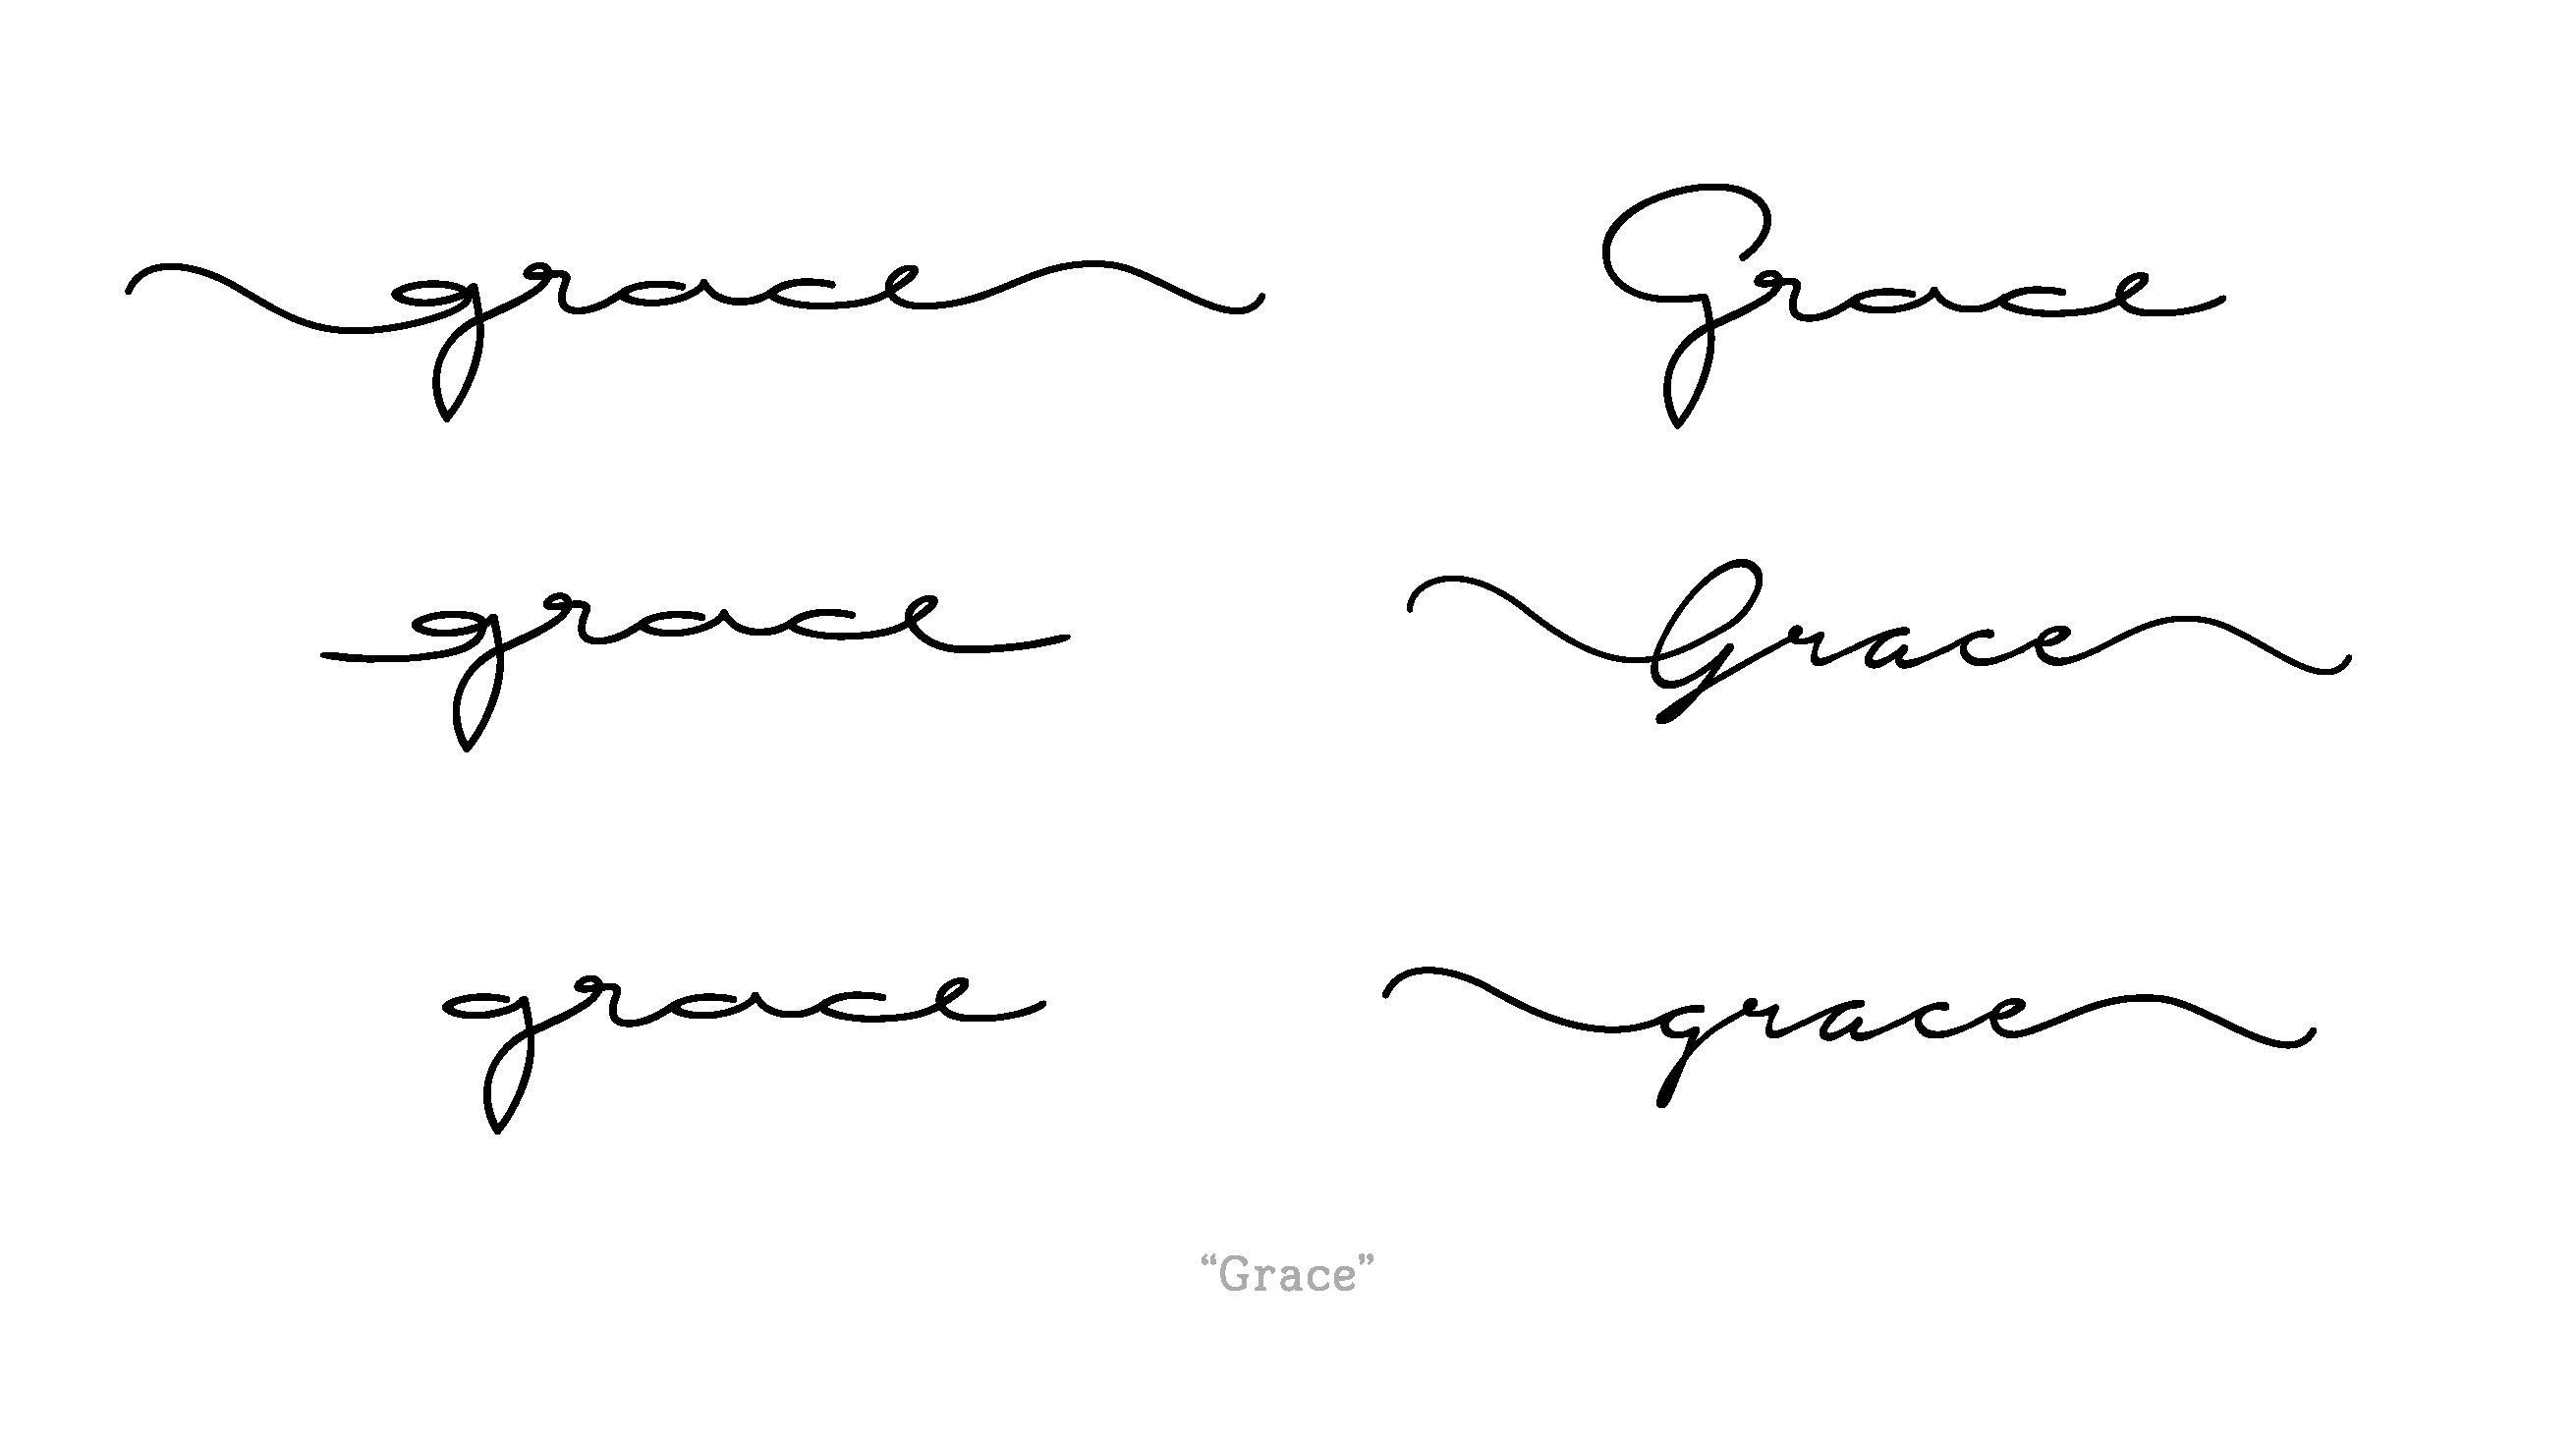 Cursive Handwriting for Tattoos New Custom Request Handwritten Cursive Font Tattoo